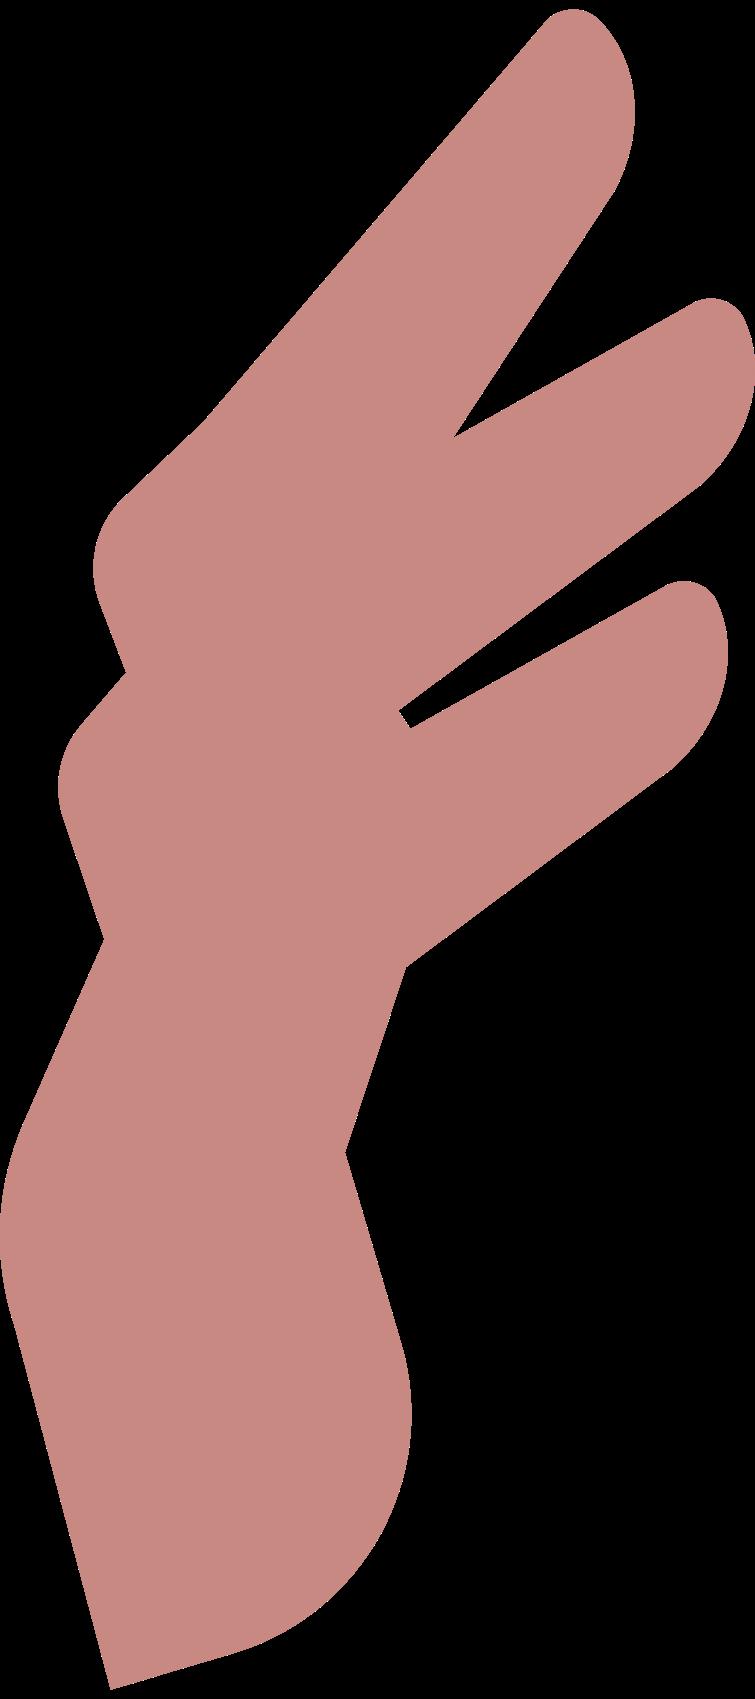 man 4 fingers Clipart illustration in PNG, SVG